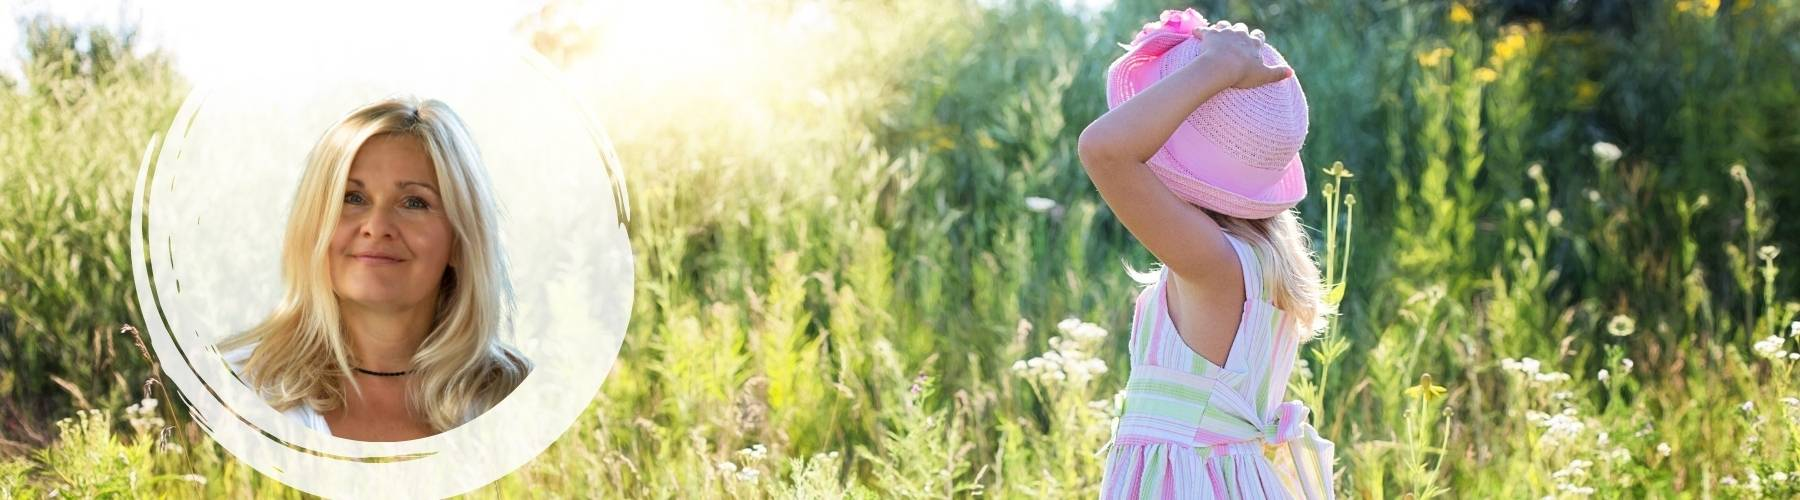 Susanne Hühn - Tagesworkshop: Kennst du dein Inneres Kind